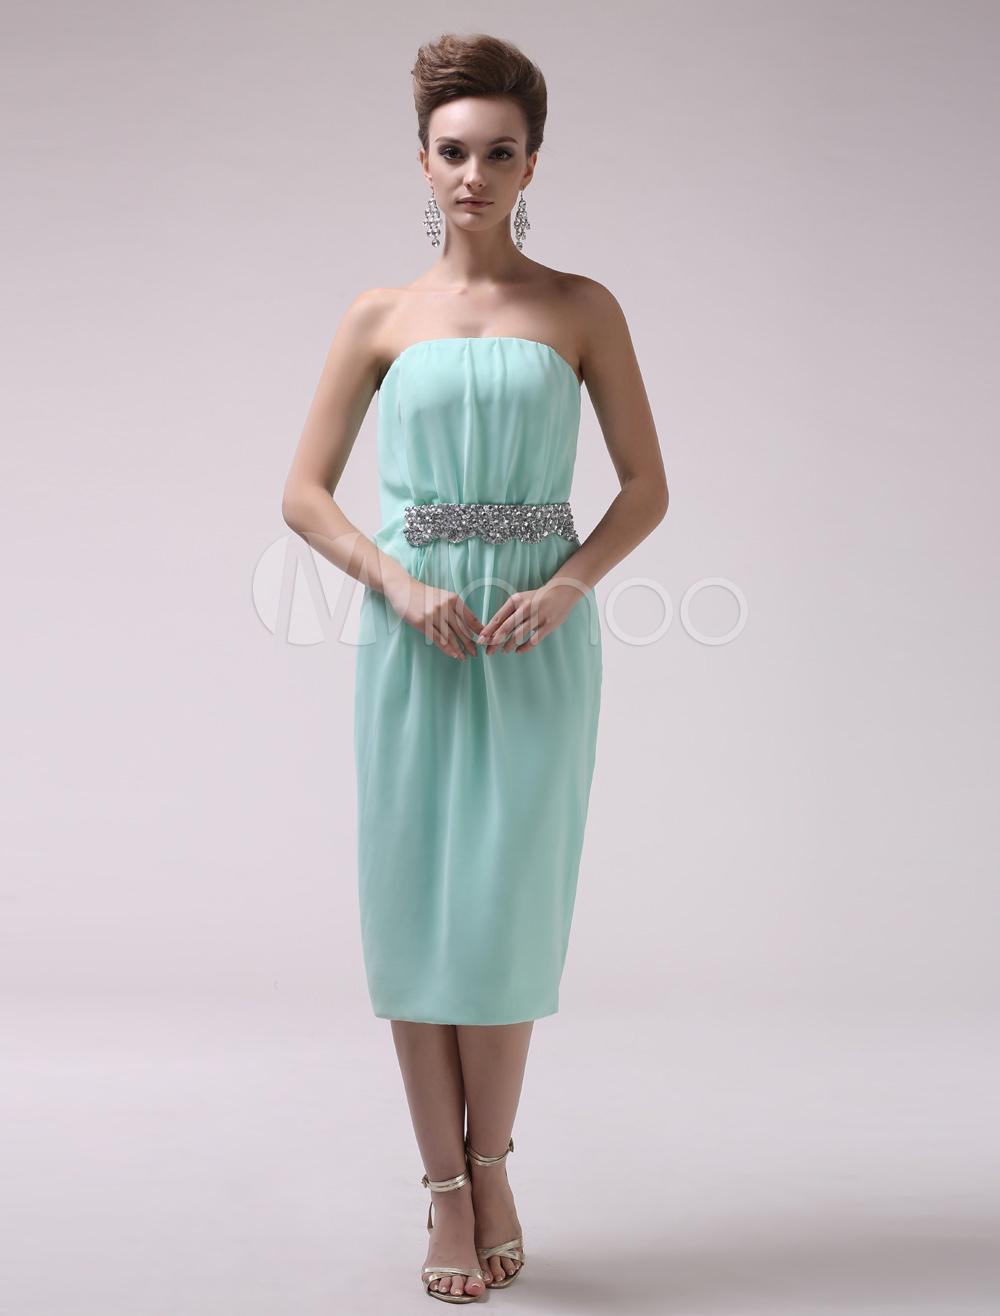 55574059dca Mint Green Sheath Beading Strapless Chiffon Modern Cocktail Dress Milanoo -  Milanoo.com